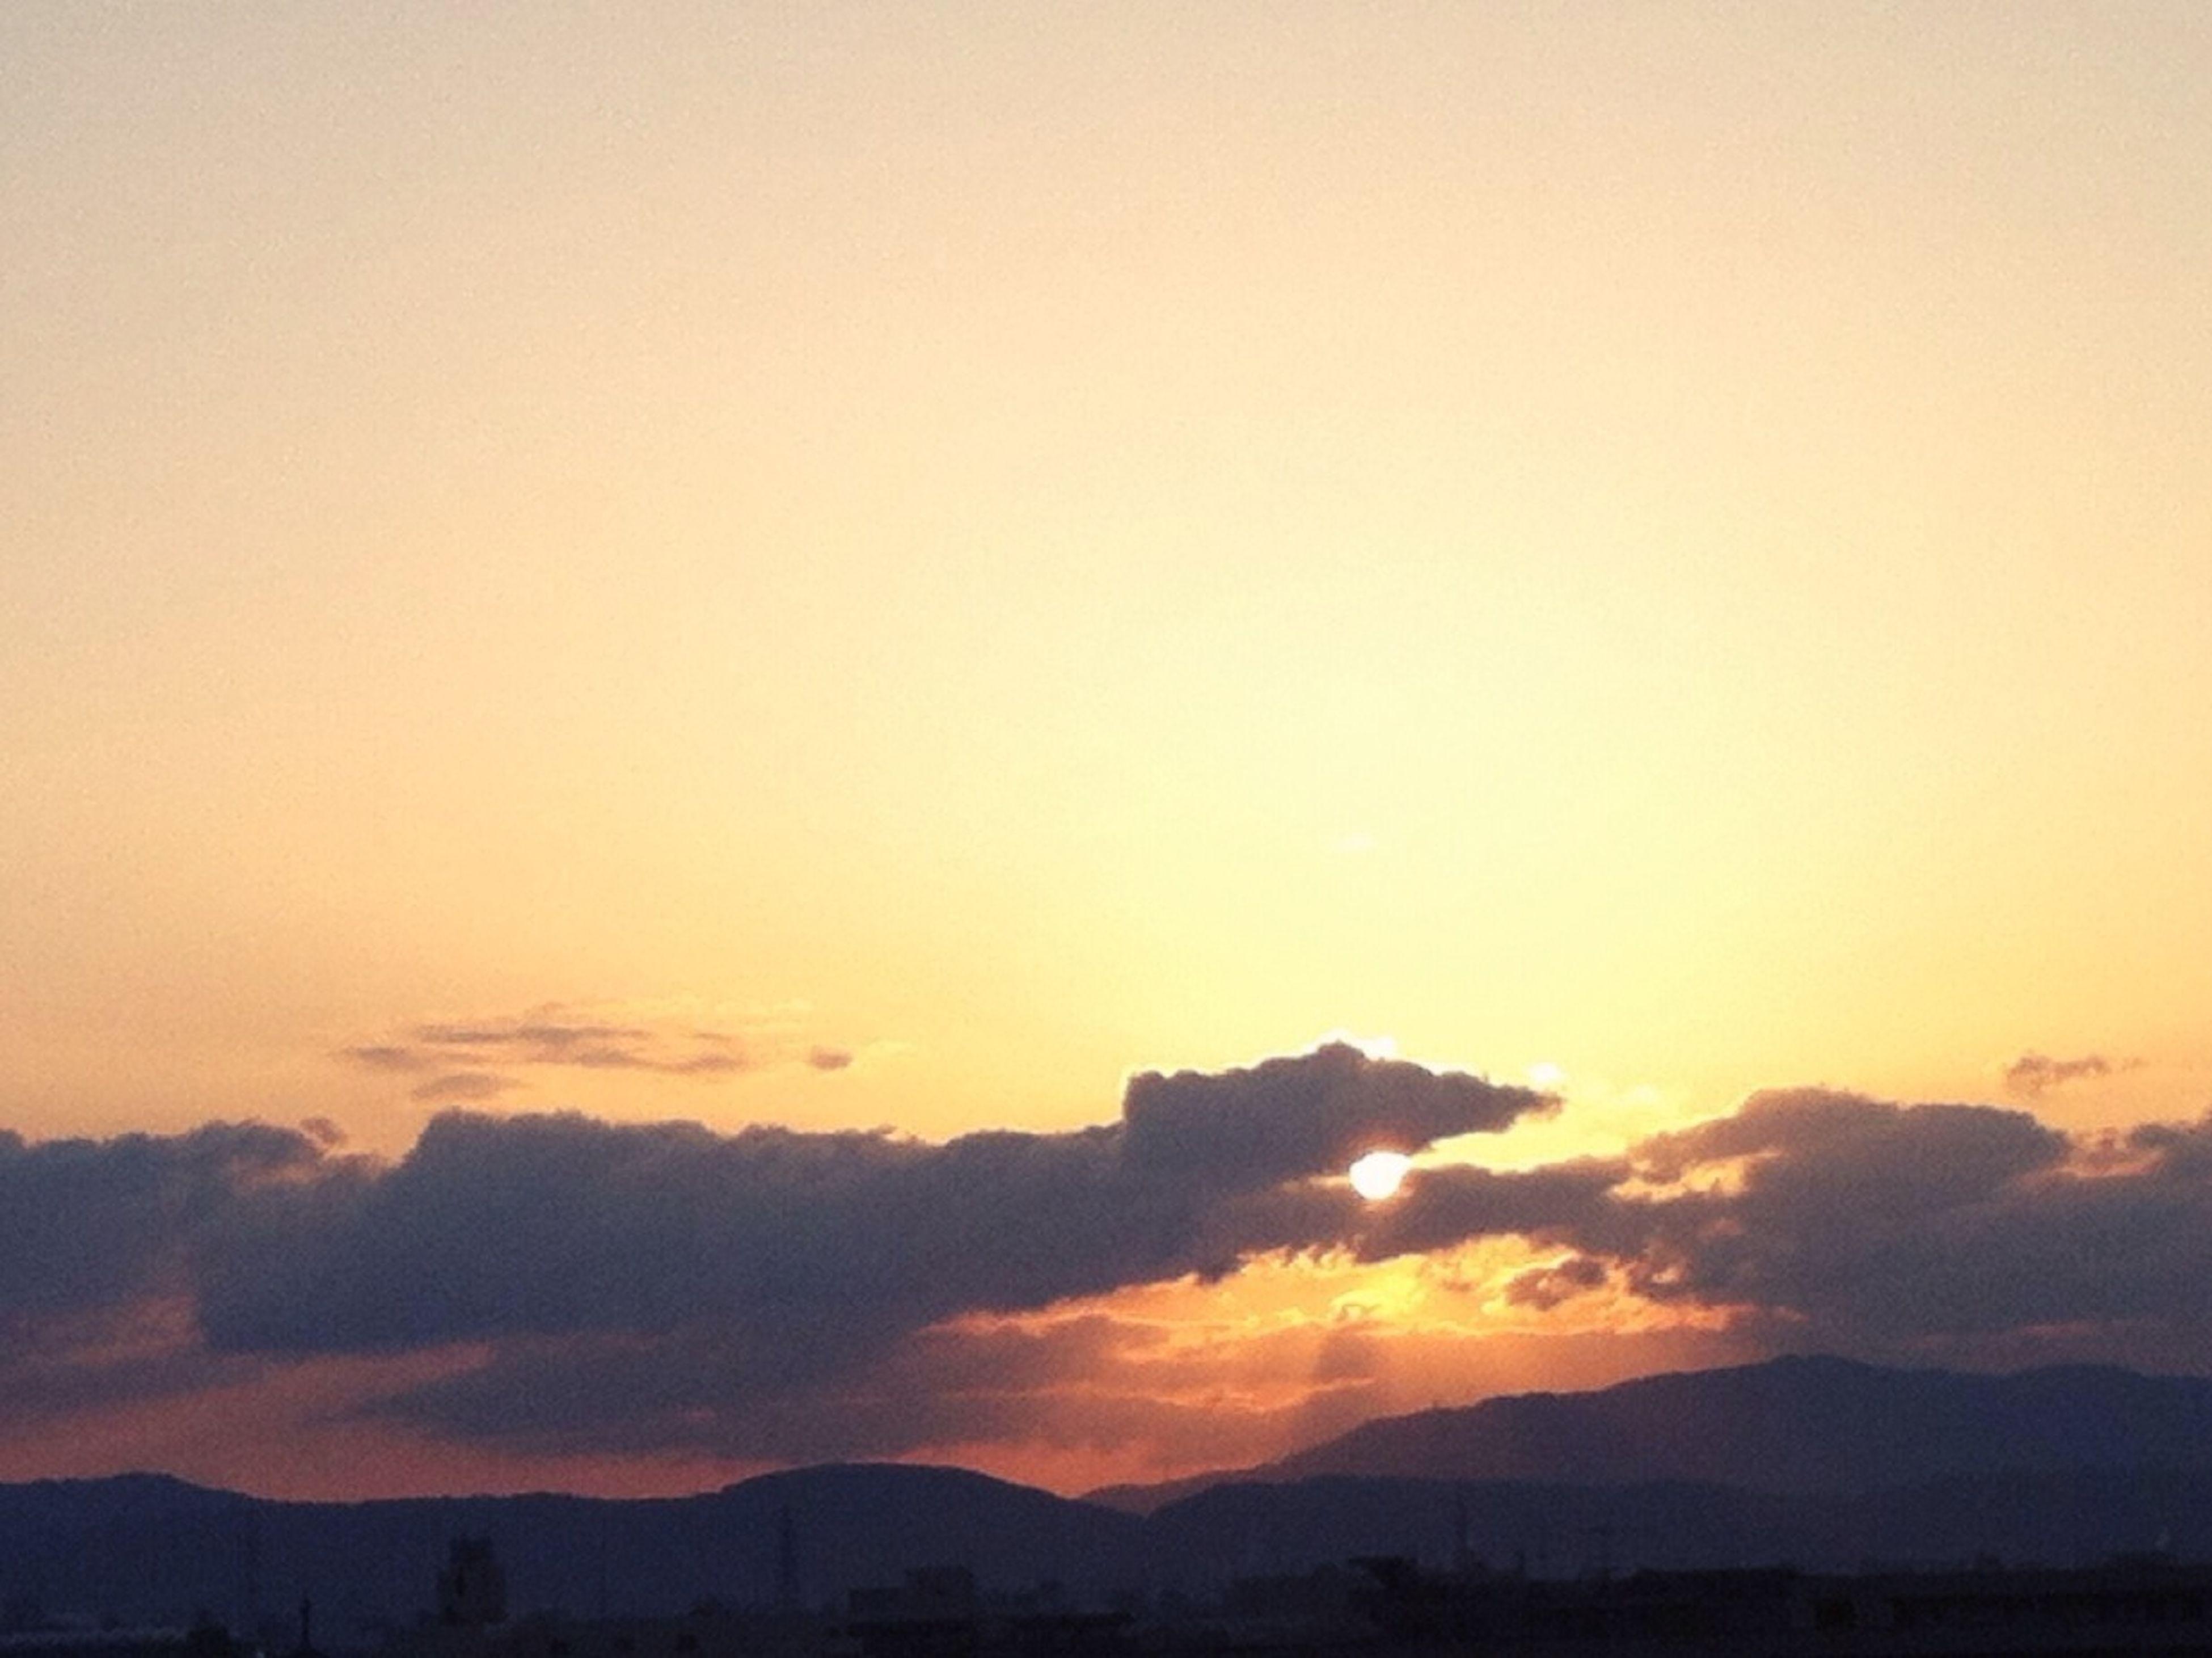 sunset, silhouette, scenics, mountain, tranquil scene, tranquility, beauty in nature, orange color, sky, mountain range, copy space, nature, idyllic, landscape, dusk, outdoors, majestic, cloud - sky, no people, non-urban scene